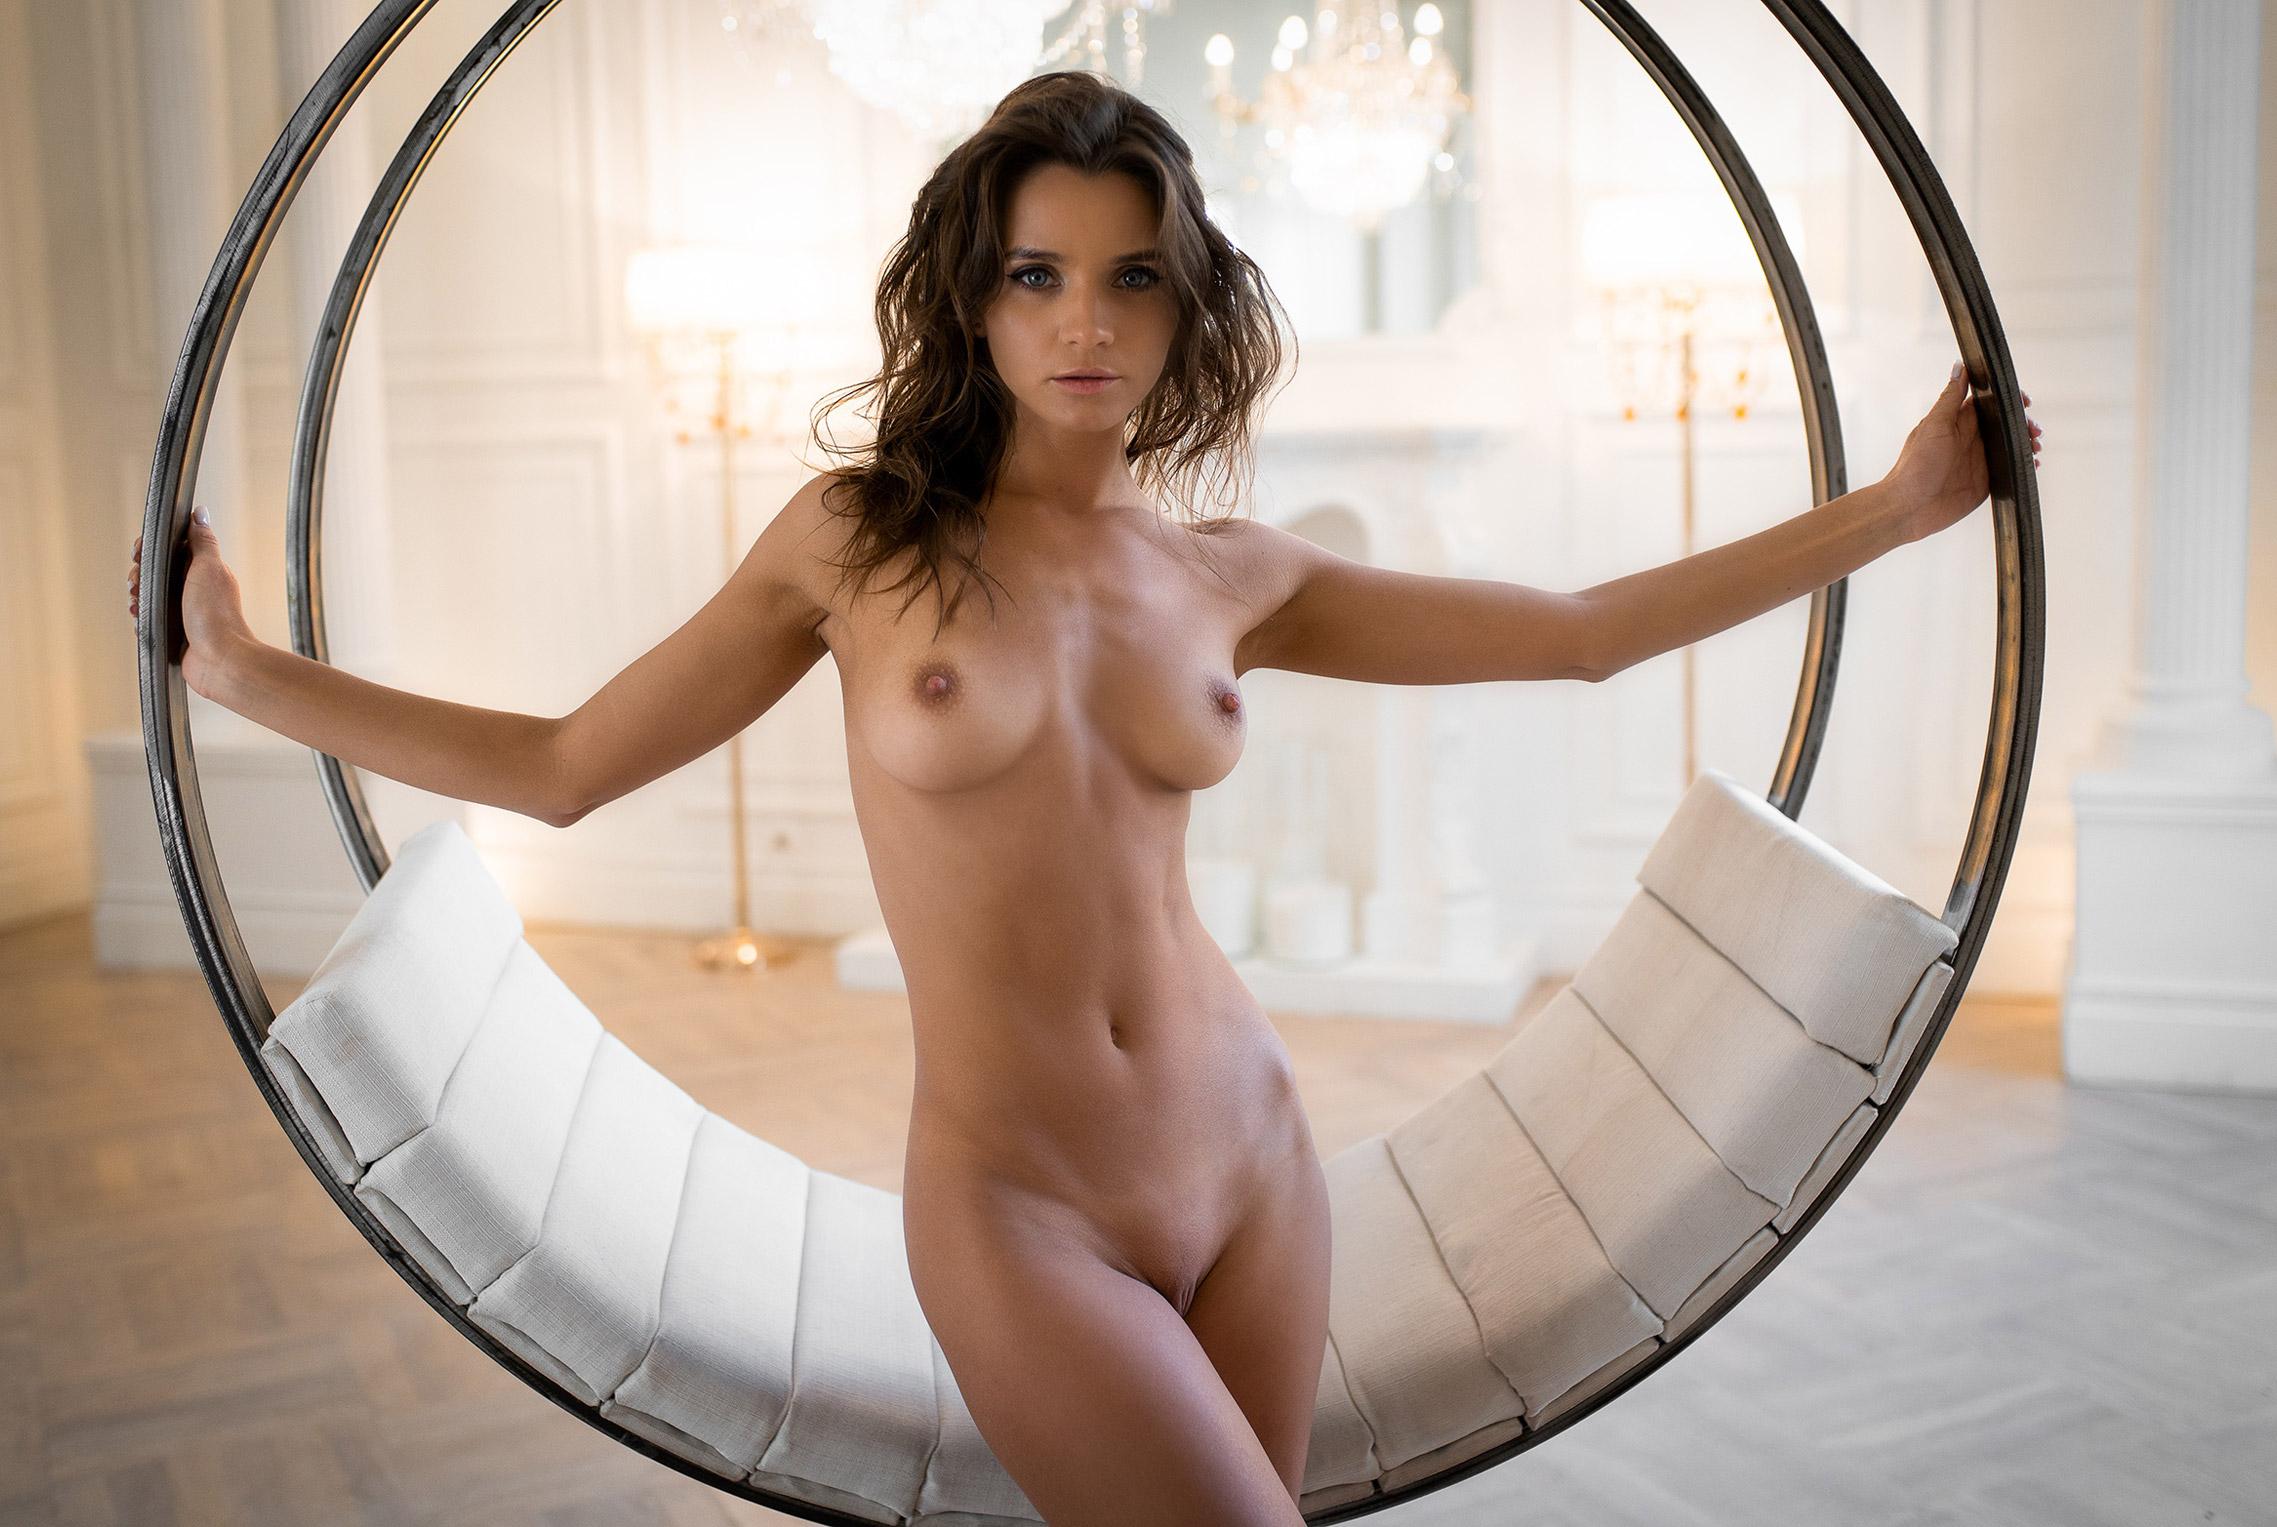 Сексуальная Кристина Макарова / Kristina Makarova nude by Vladimir Nikolaev